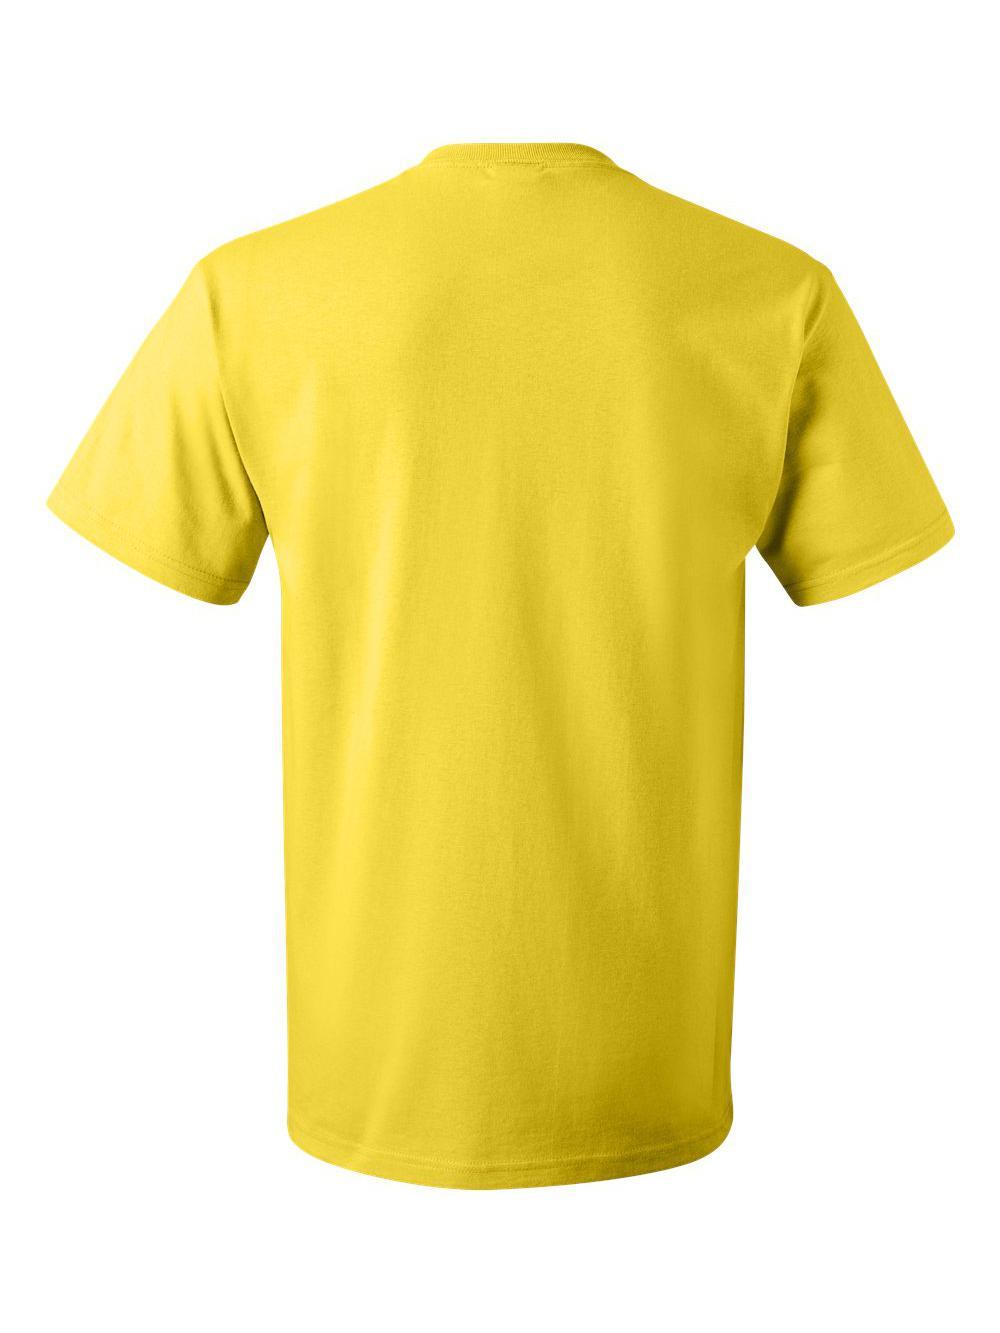 Fruit-of-the-Loom-HD-Cotton-Short-Sleeve-T-Shirt-3930R thumbnail 145